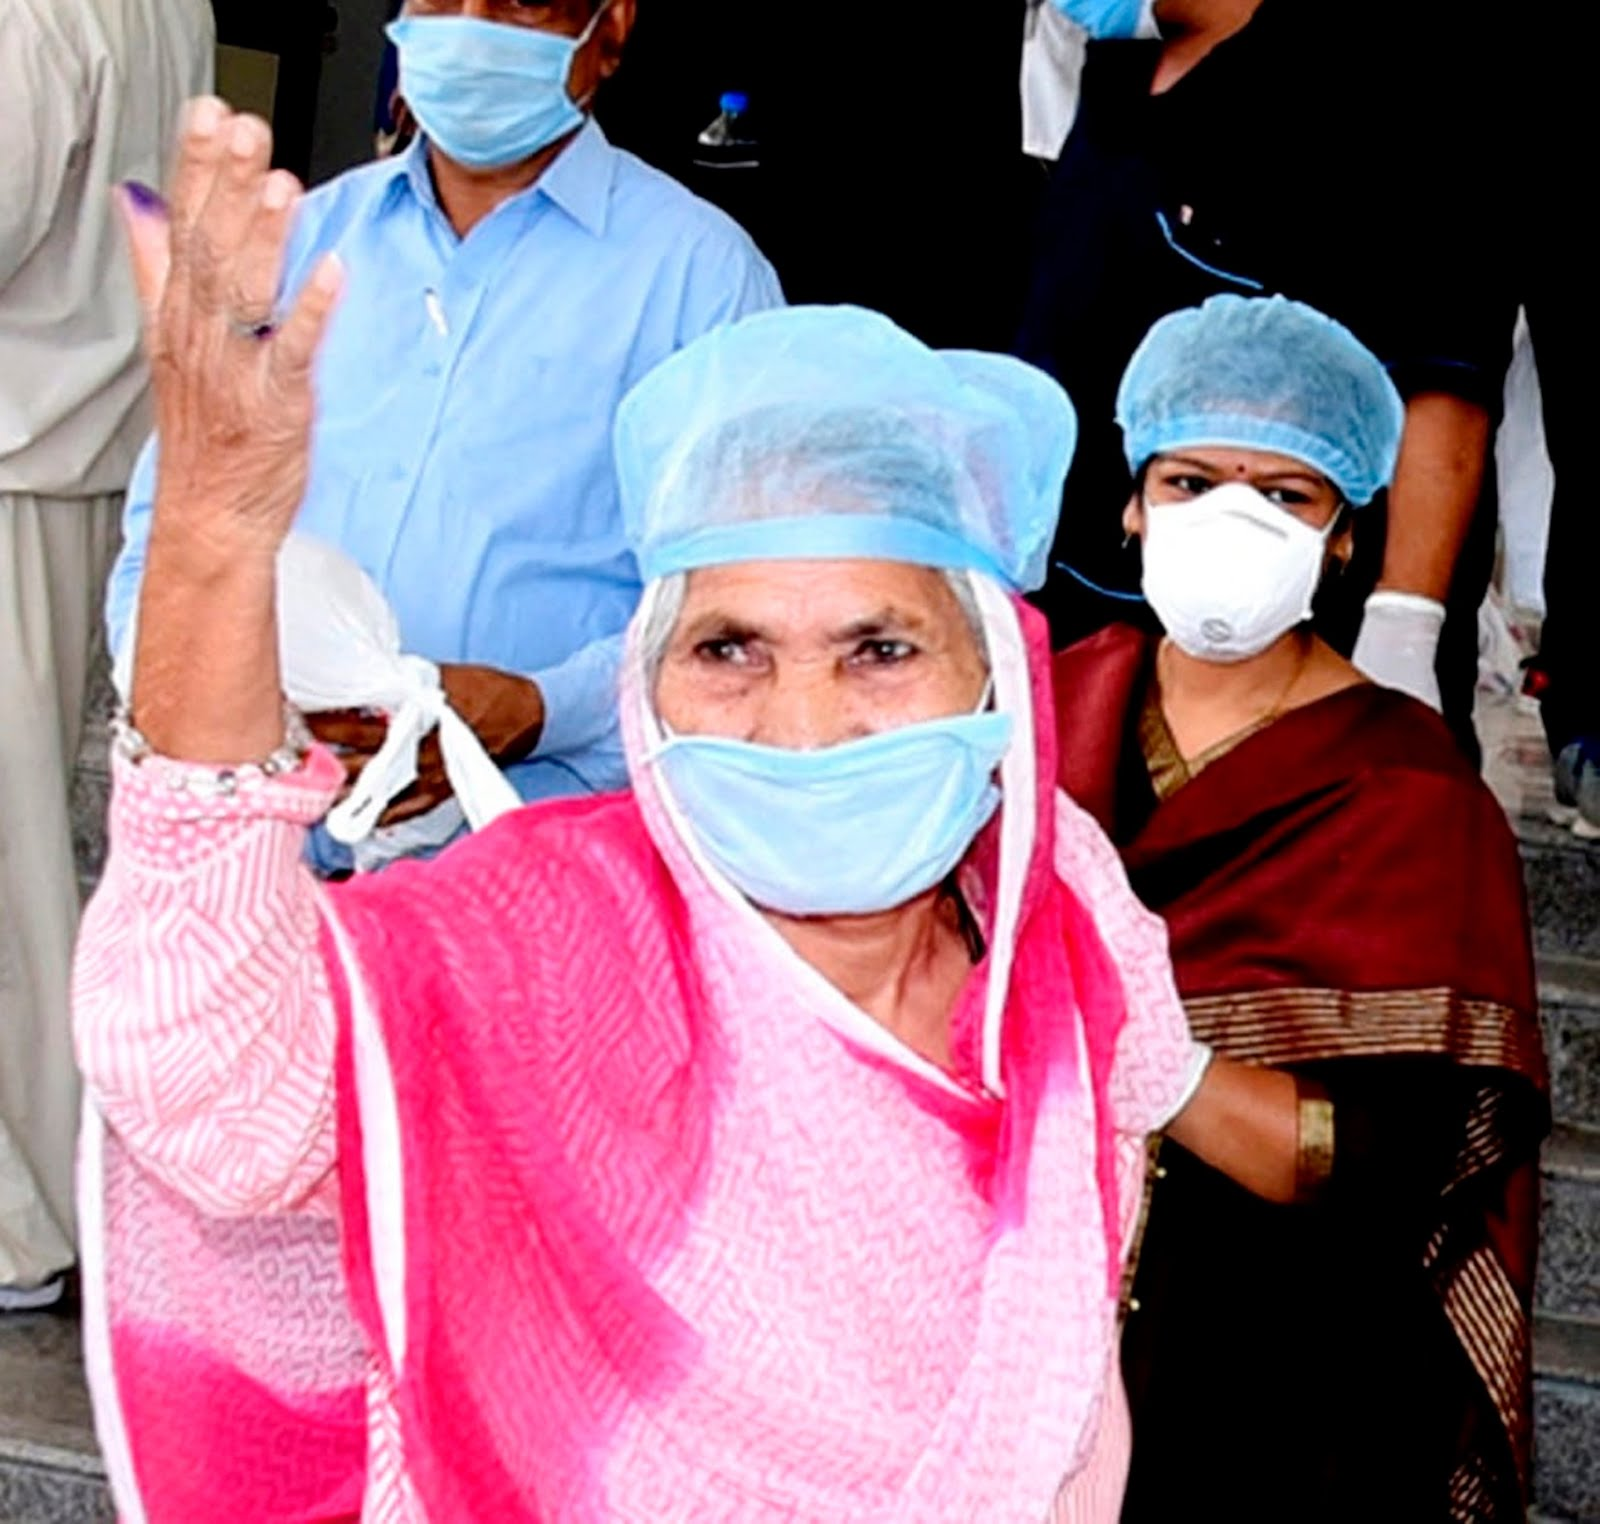 Ratlam News- 75 वर्षीय अस्थमा पेशेंट ने हौसले के साथ कोरोना से जंग जीती